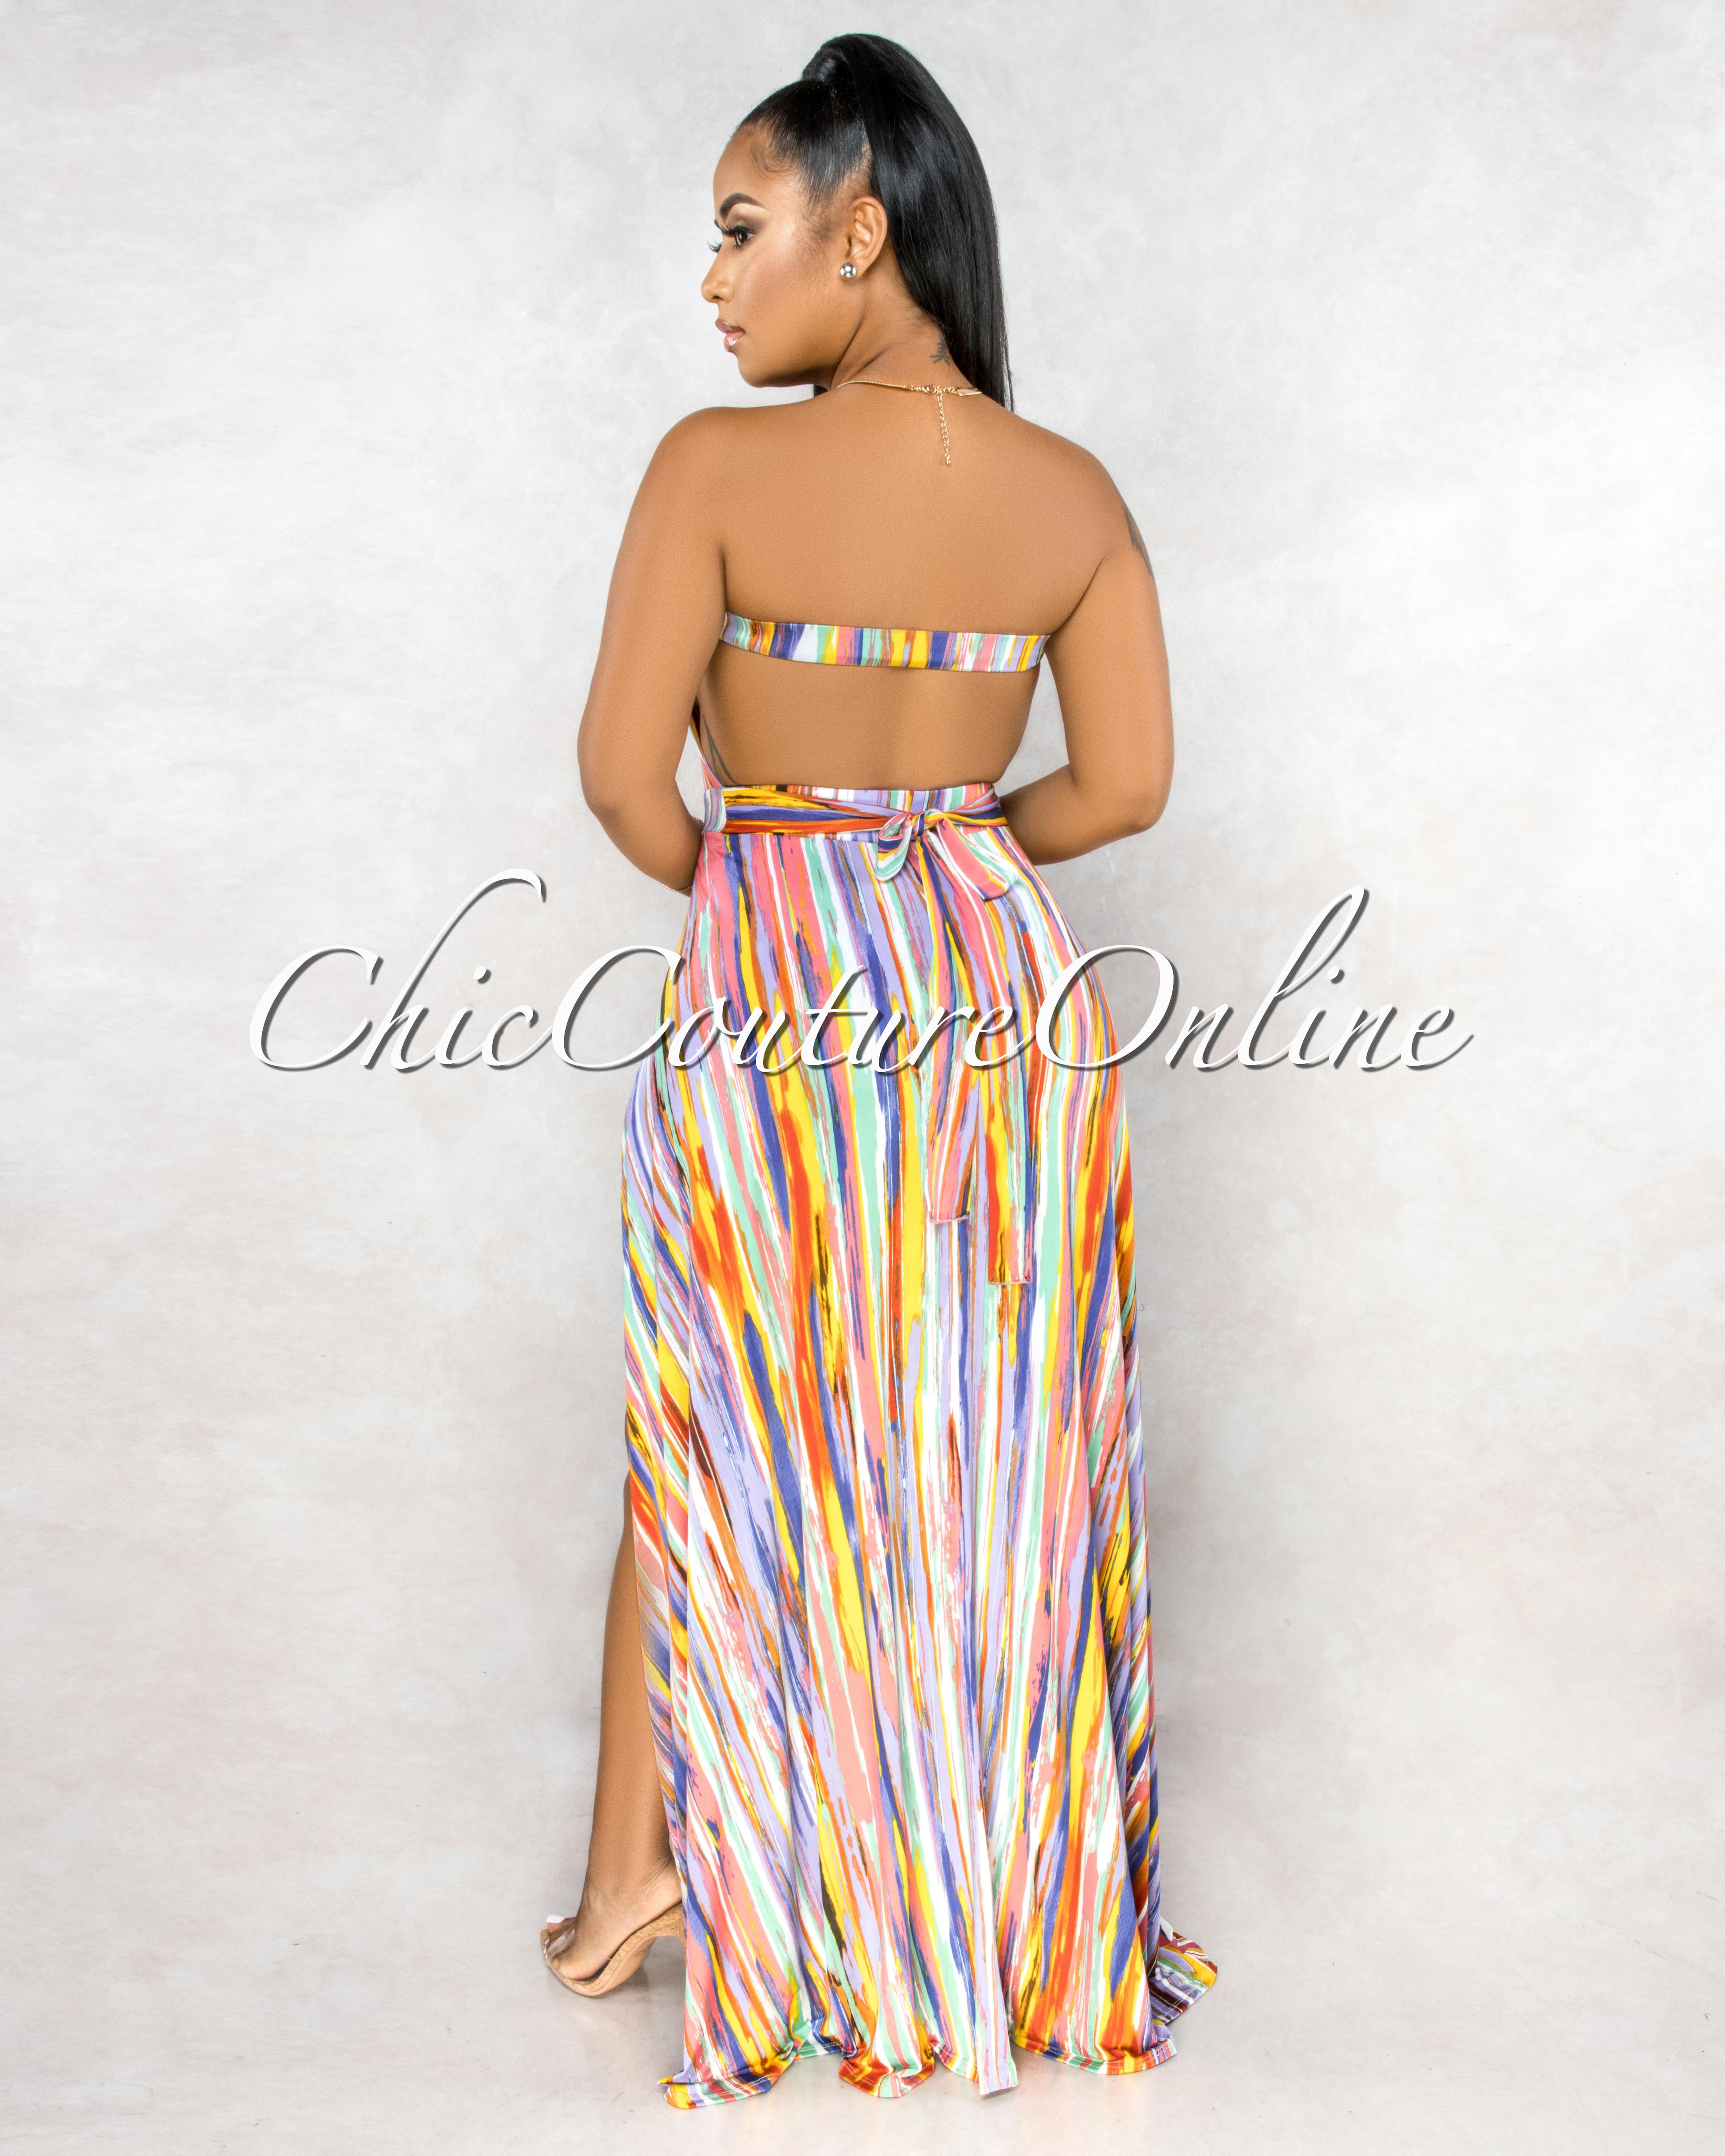 Zeraldina Coral Lilac Multi-Color Print Slit Legs Bodysuit Maxi Dress